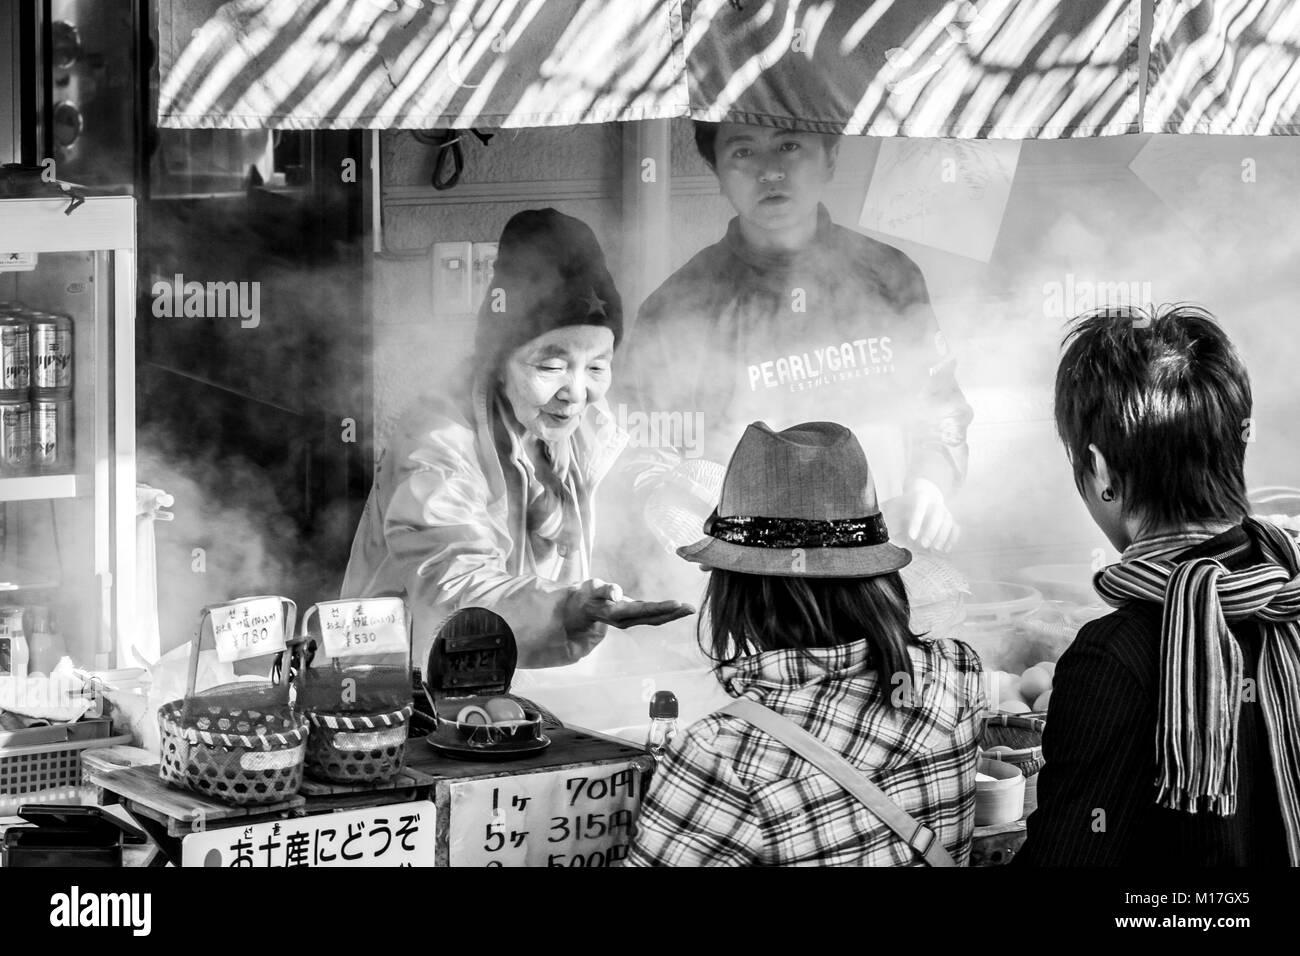 Beppu, Japan. Street food vendor selling boiled eggs popular fast food in Beppu. Black and white image. - Stock Image